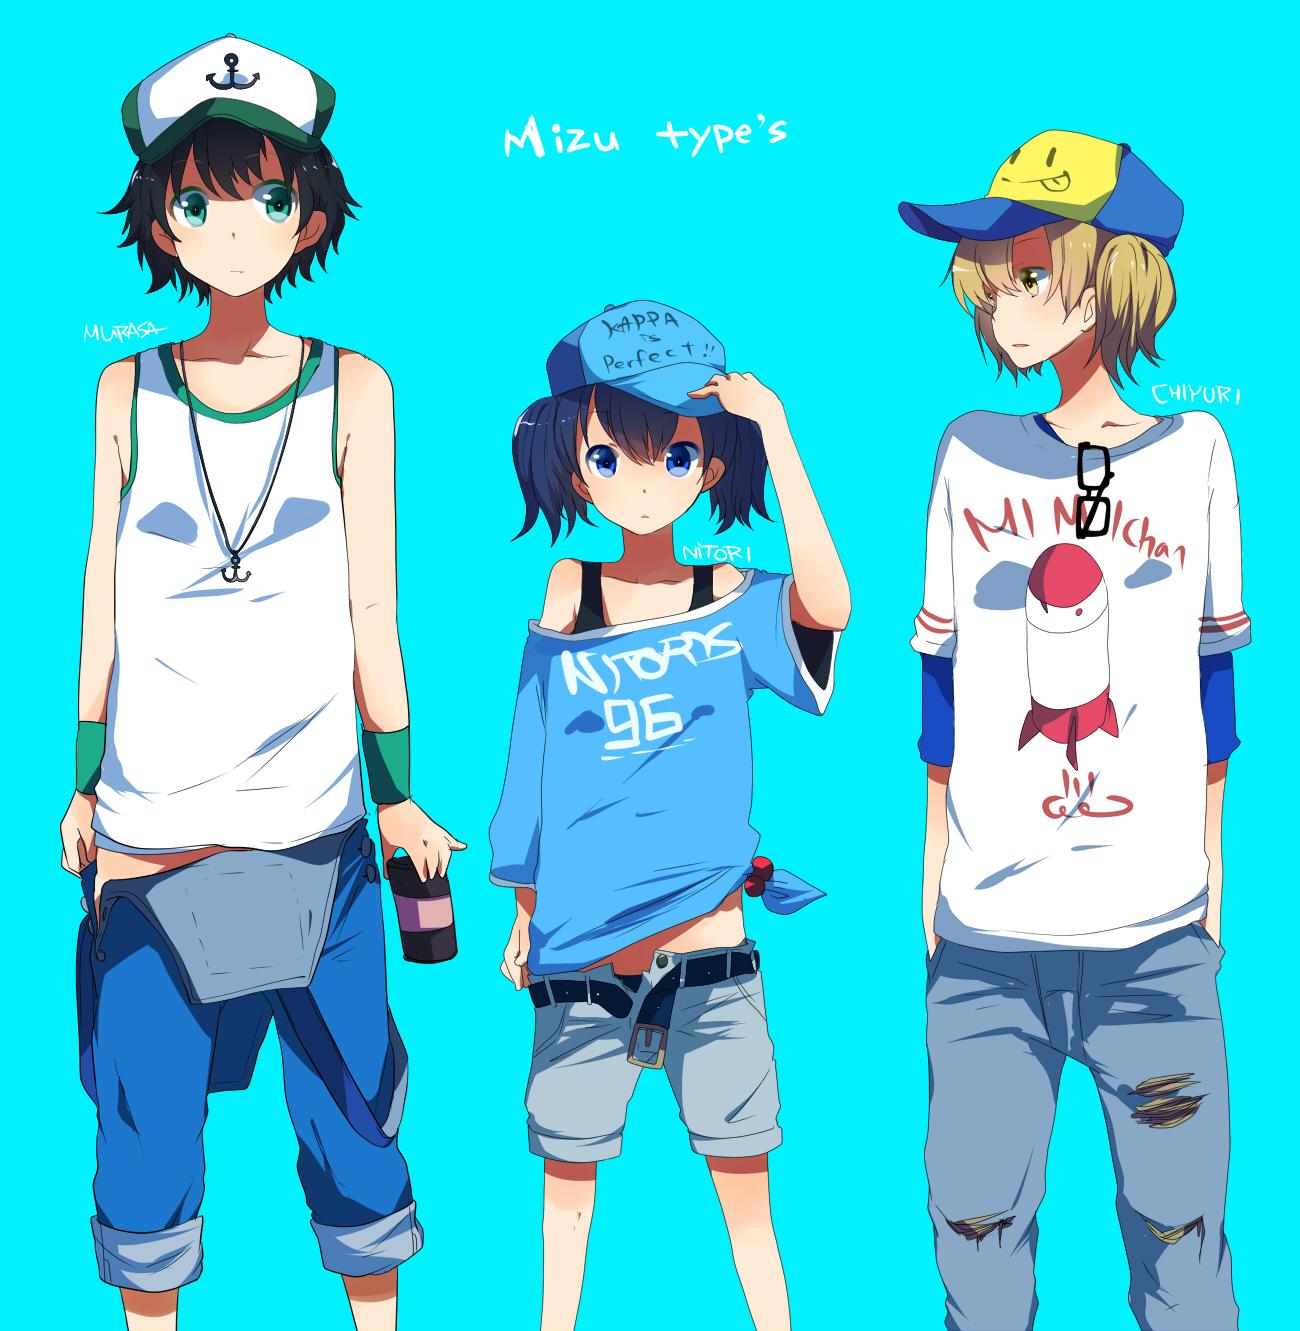 82+ Anime Clothes Tomboy - Photo Kano 01 Nonoka Tomboy Softball Team Mitt Smile Harem Tags ...